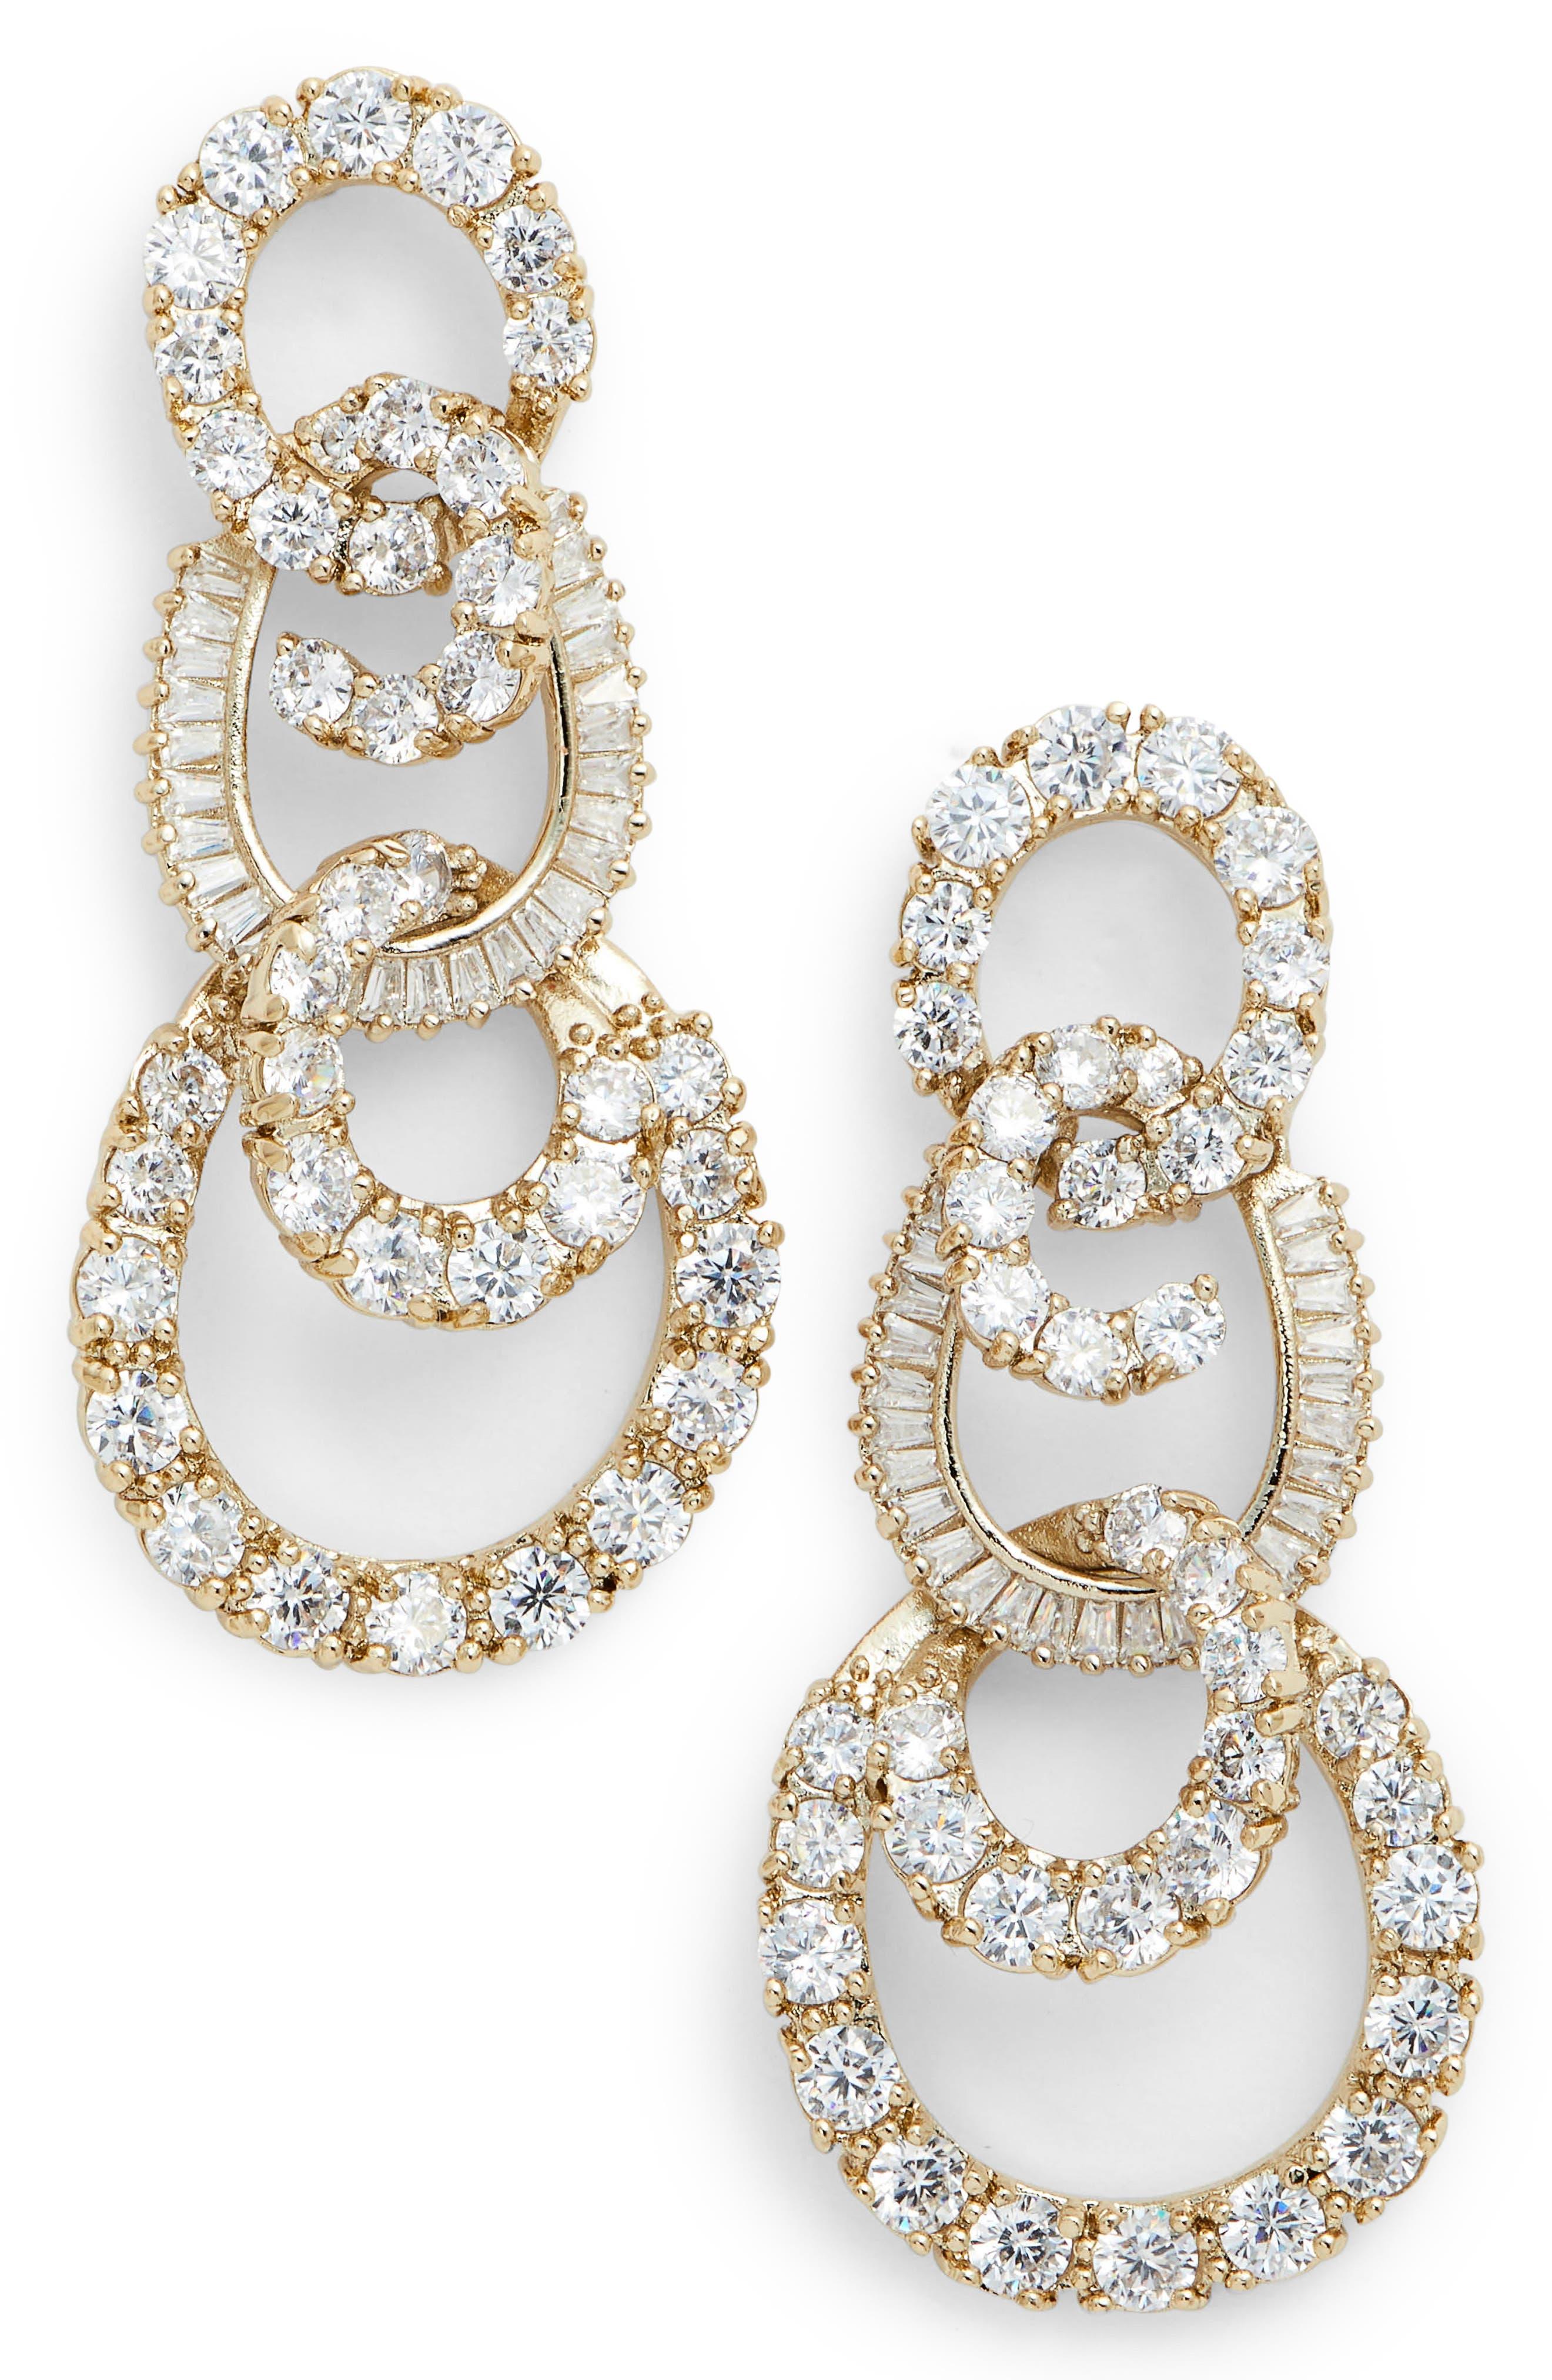 3-Tier Swirl Drop Earrings,                         Main,                         color, White/ Gold